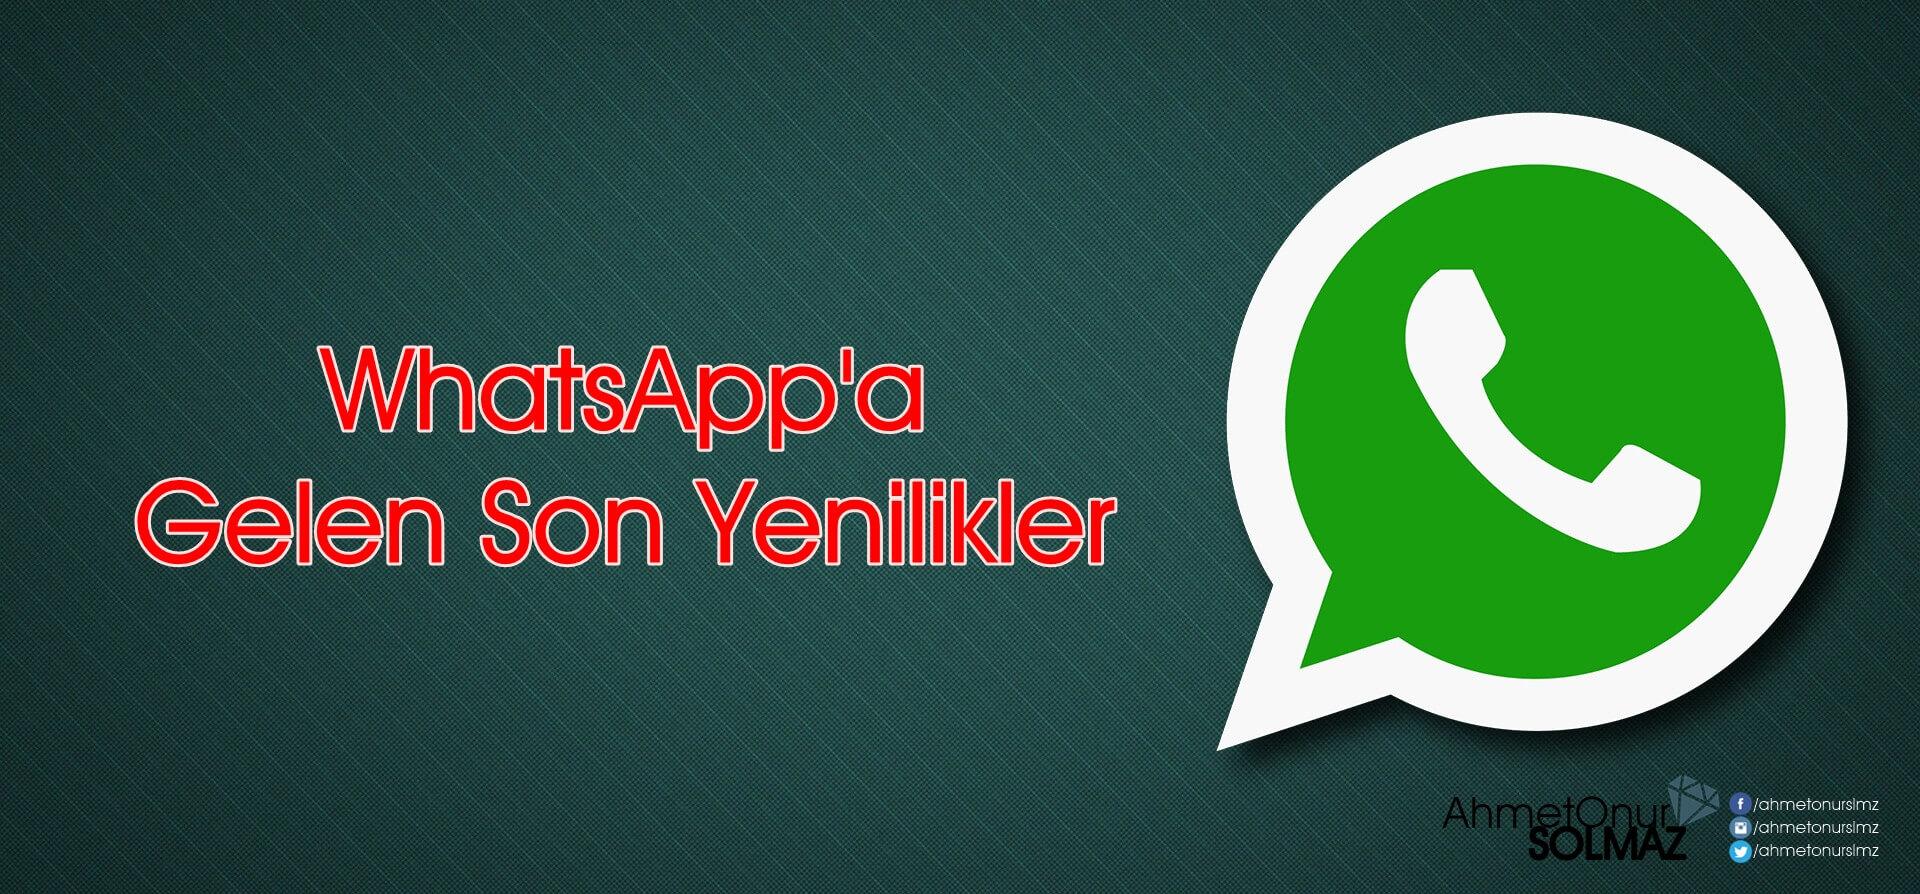 WhatsApp'a Gelen Son Yenilikler